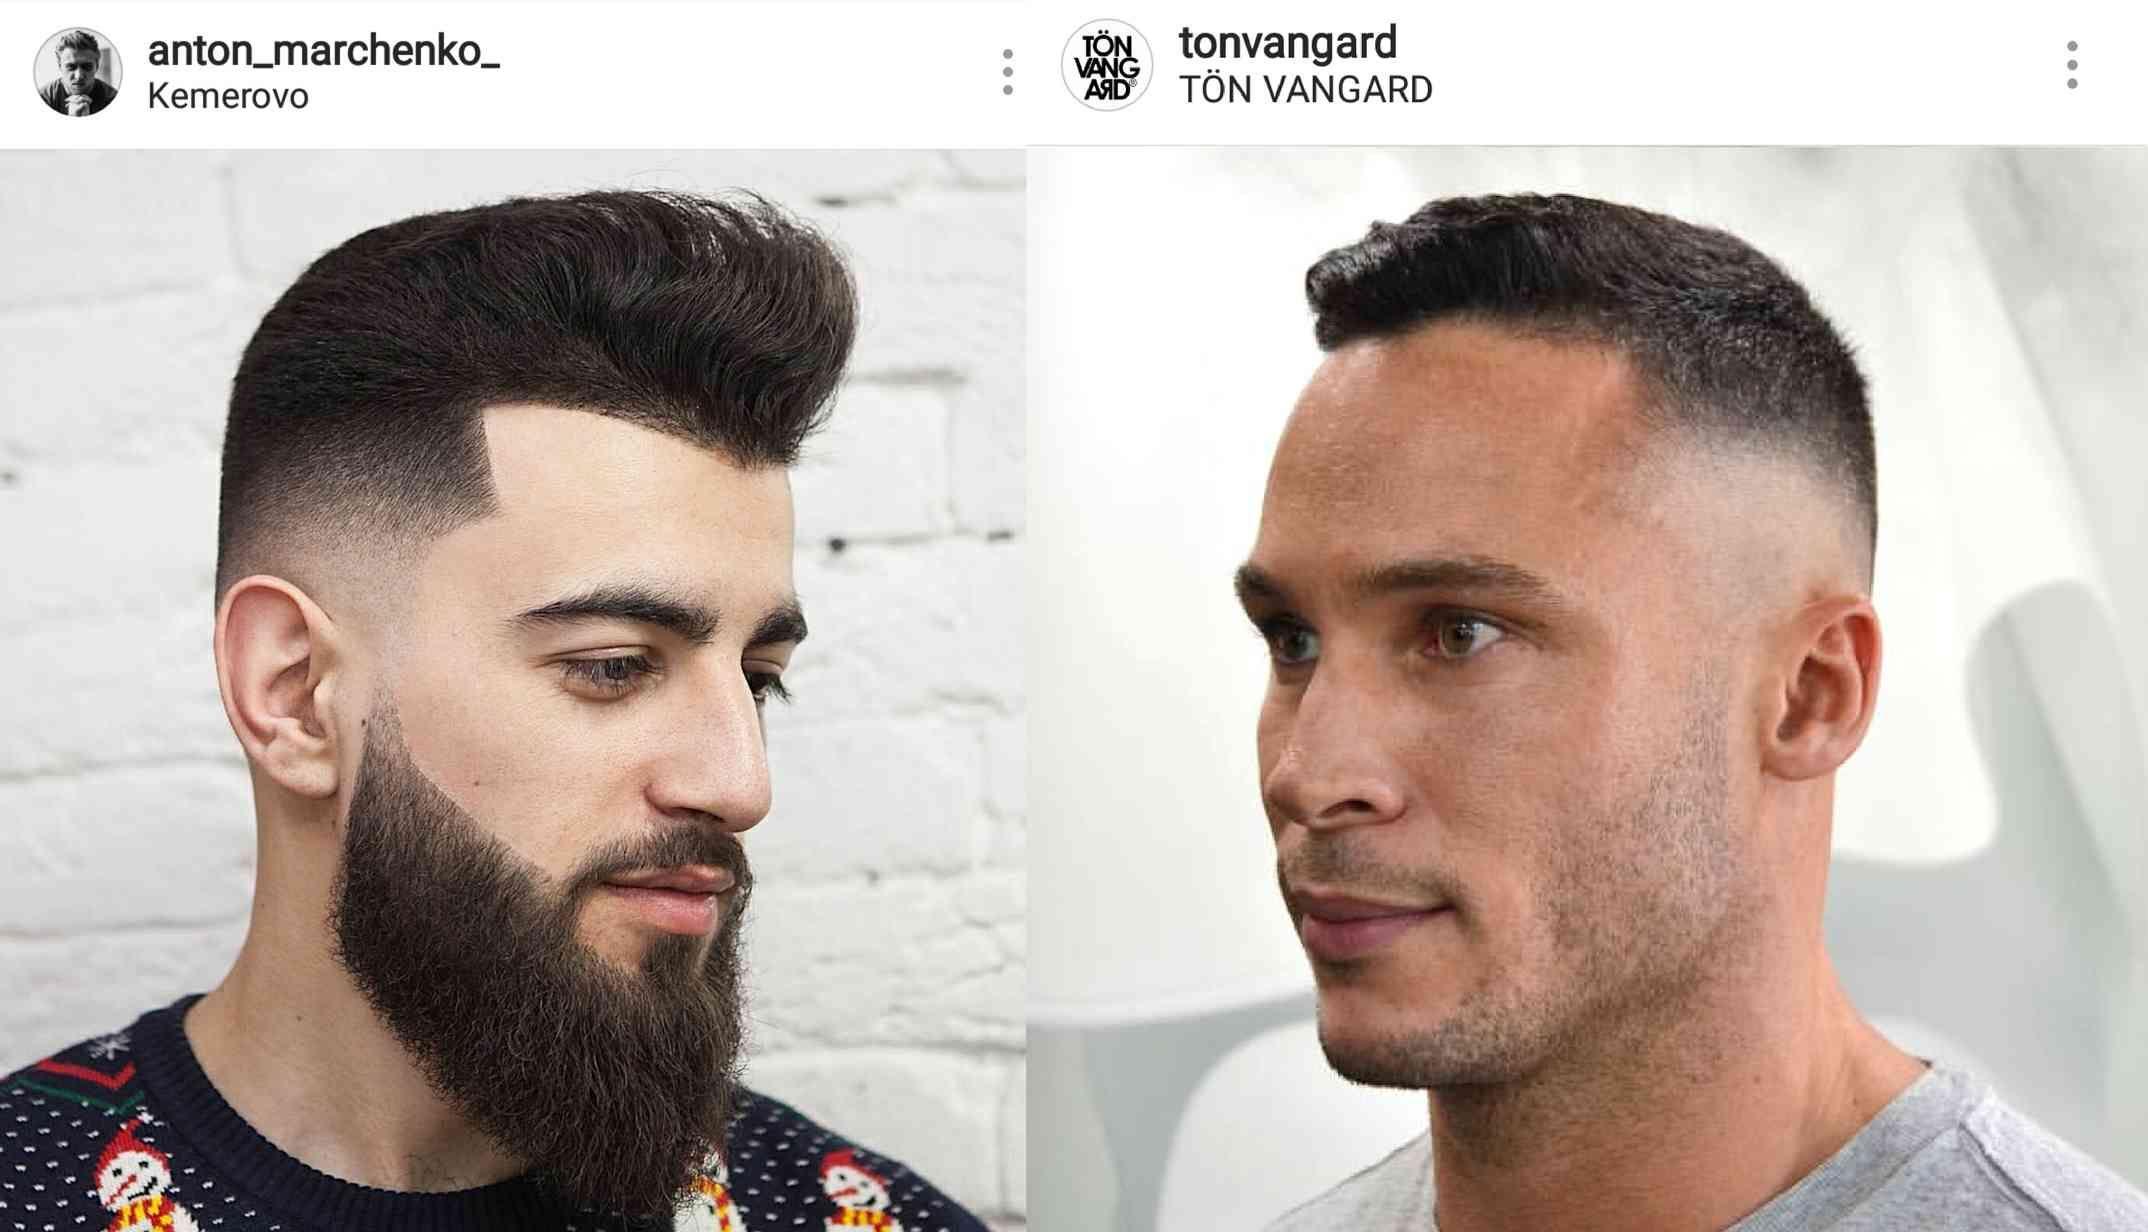 Haircuts 2018 Instagram Trends Beautyblogger Nailpolish